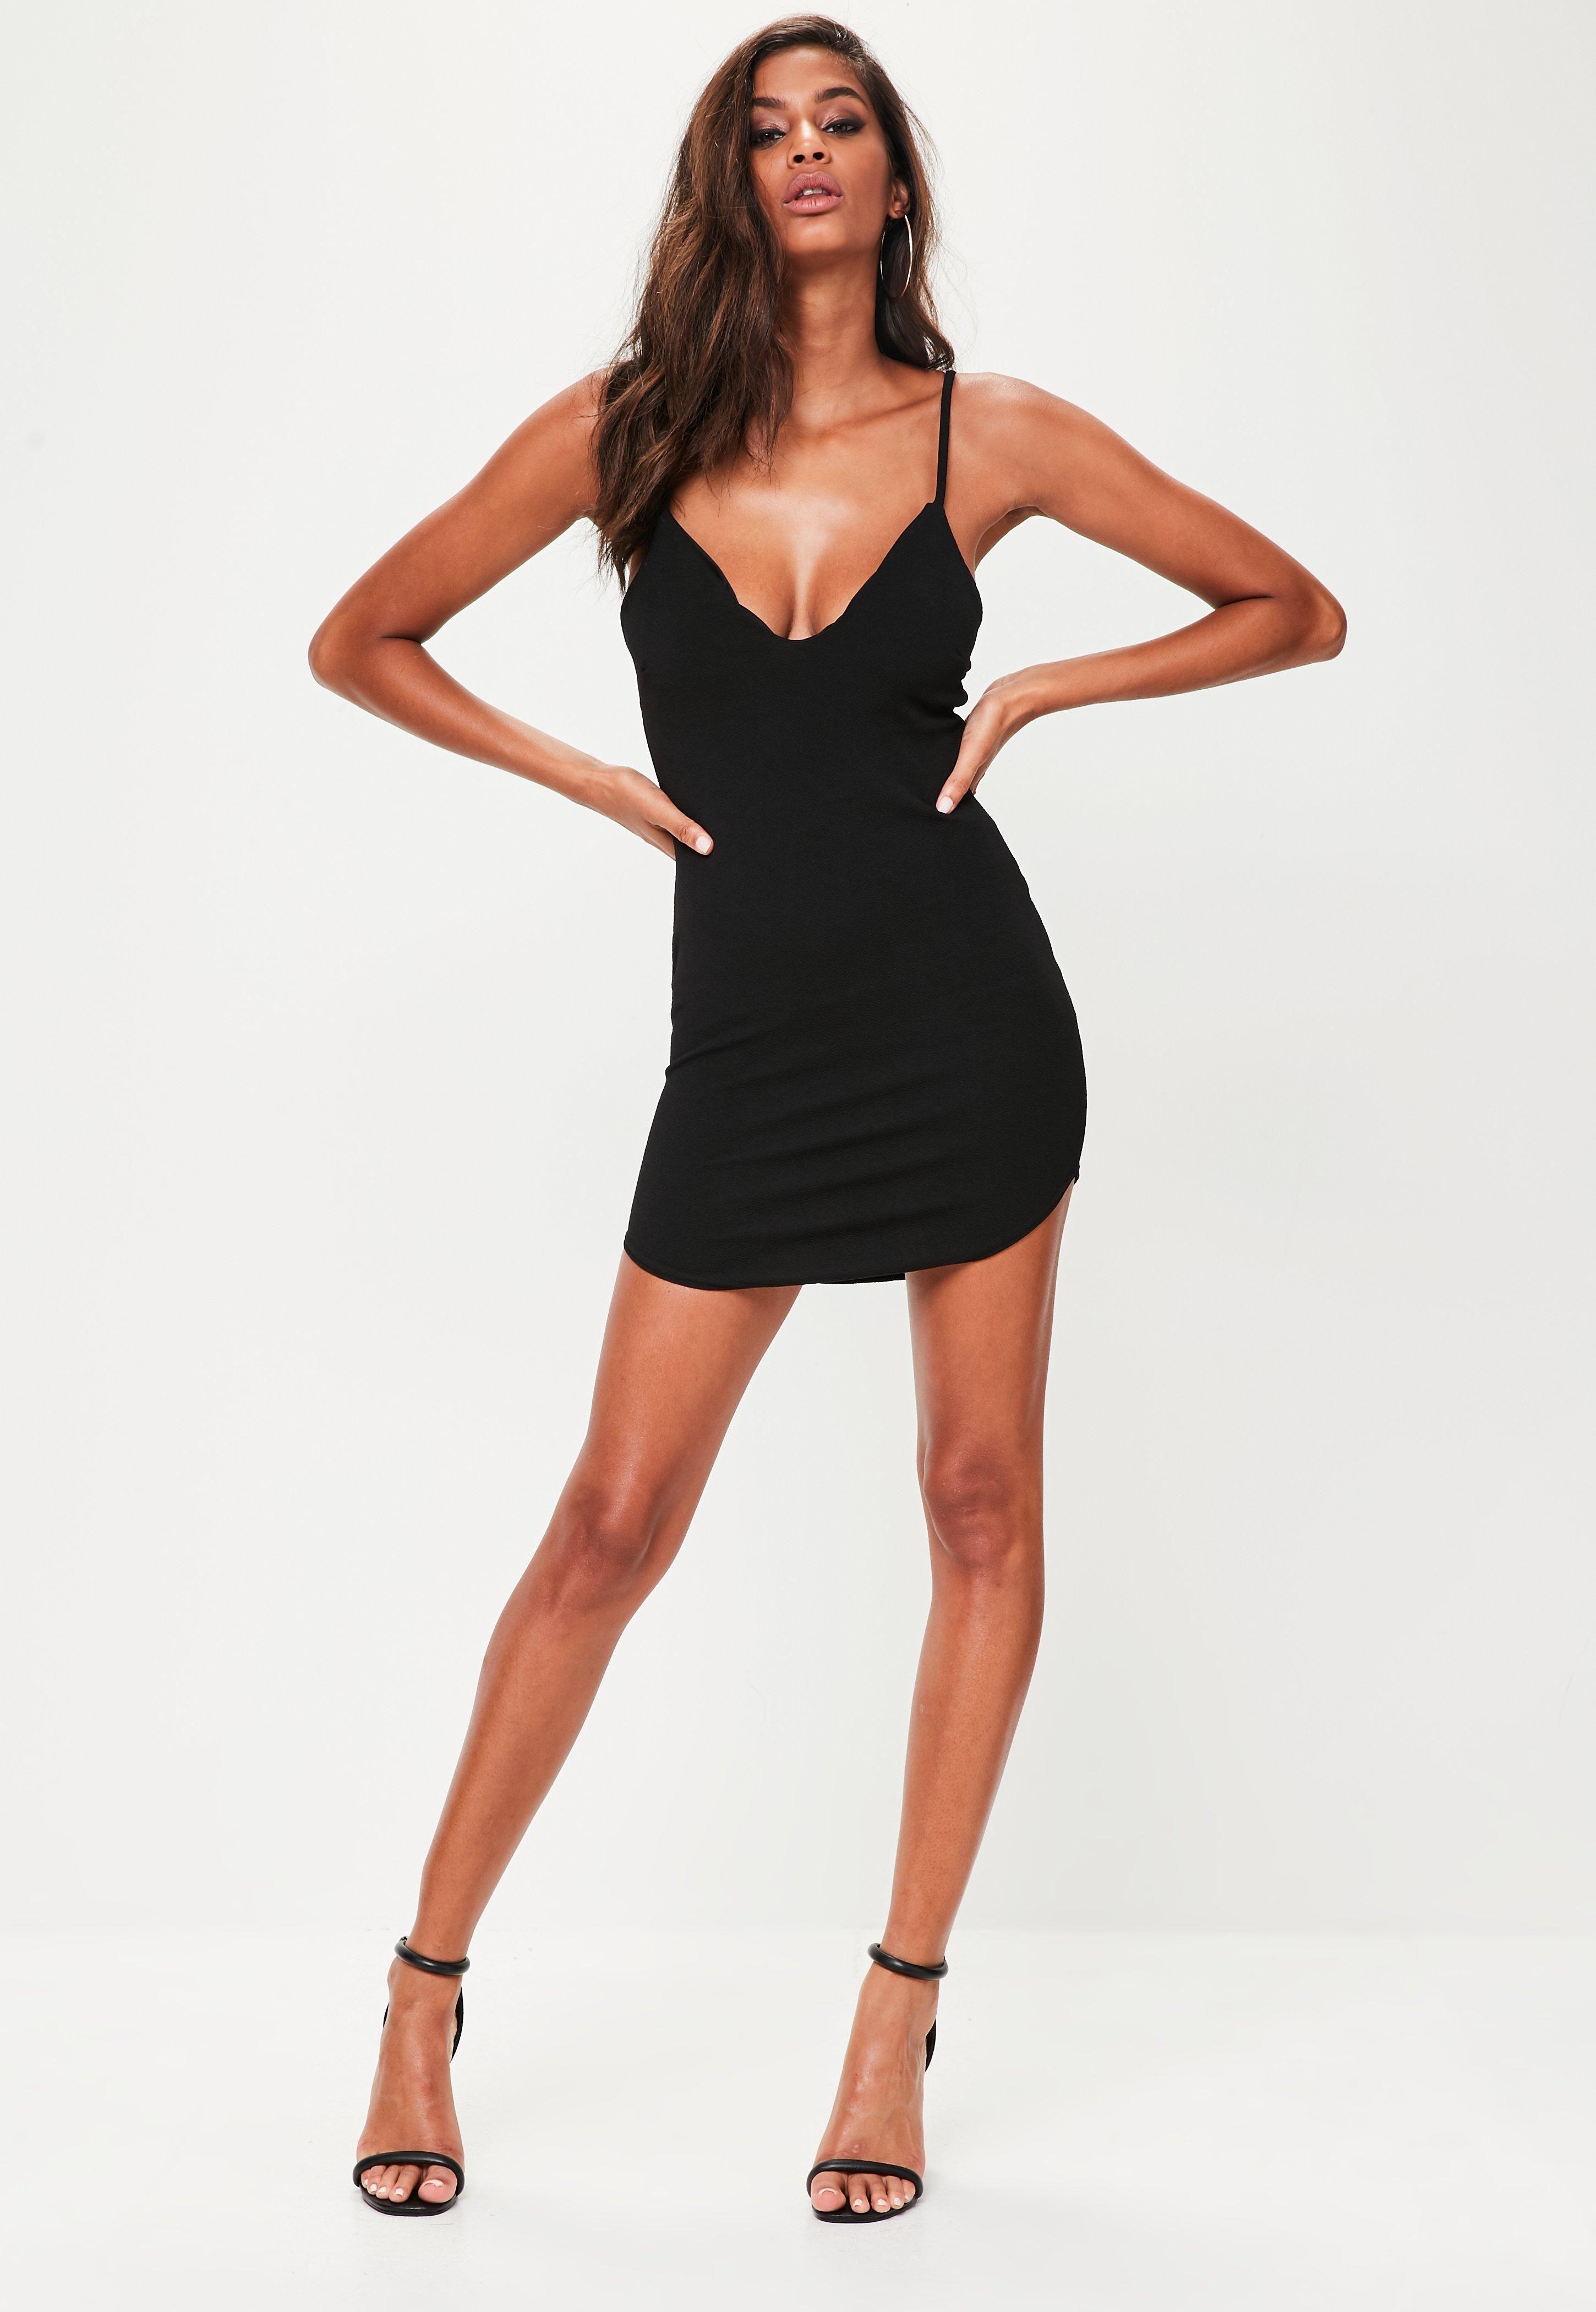 Petite Black Strappy Plunge Bodycon Dress  Schwarzes bodycon